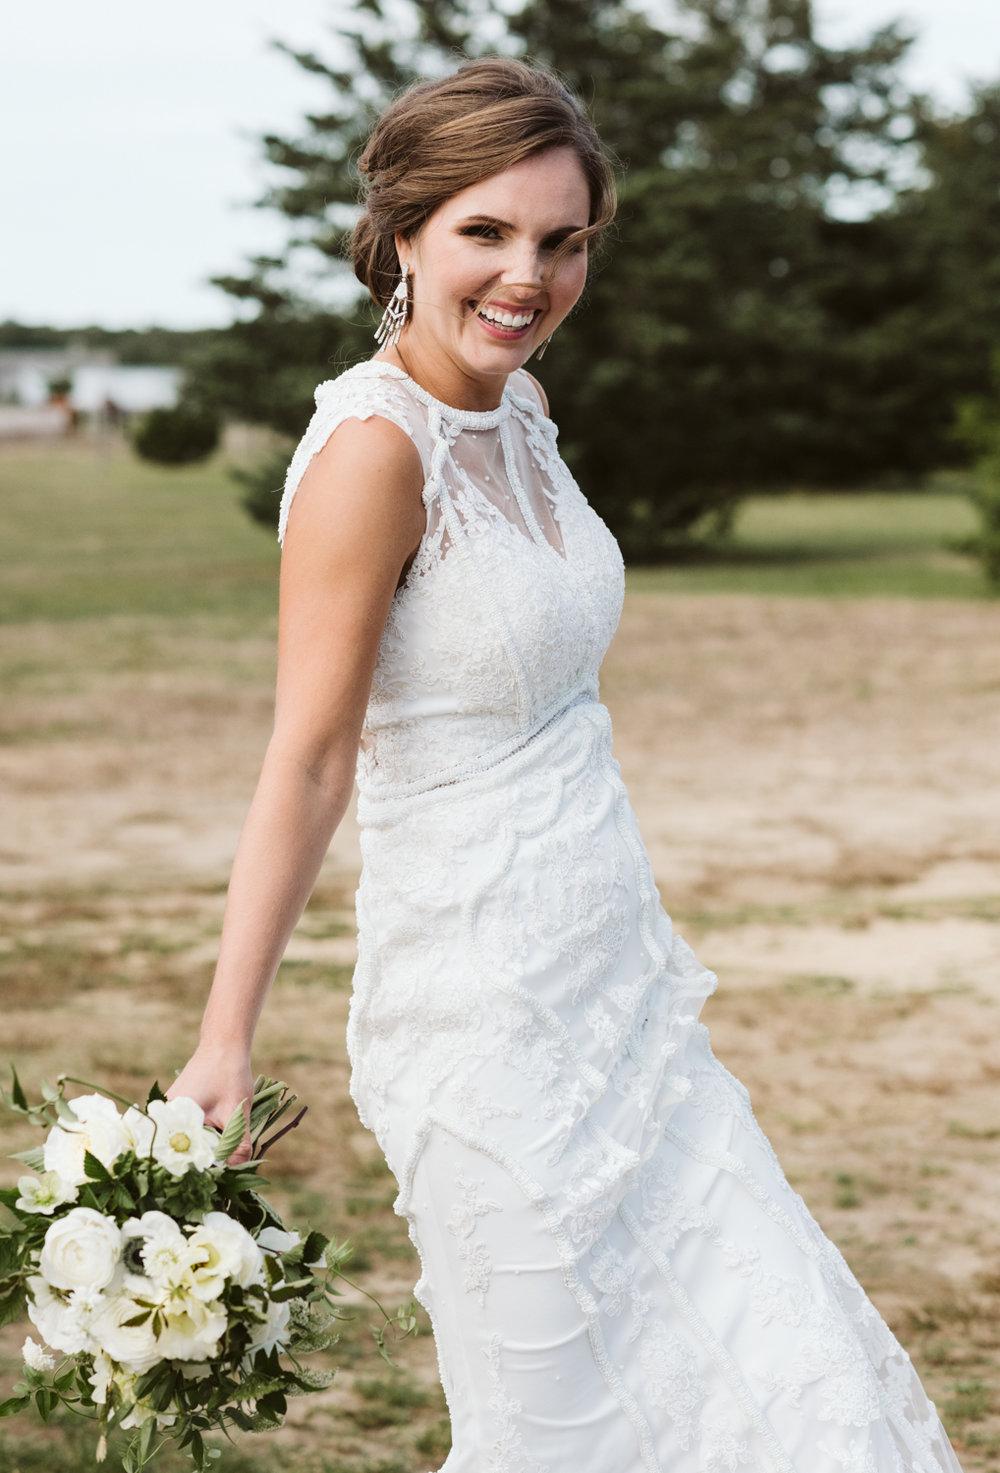 ashley_jeff_wedding_marthas_vineyardDSC_9579.jpg